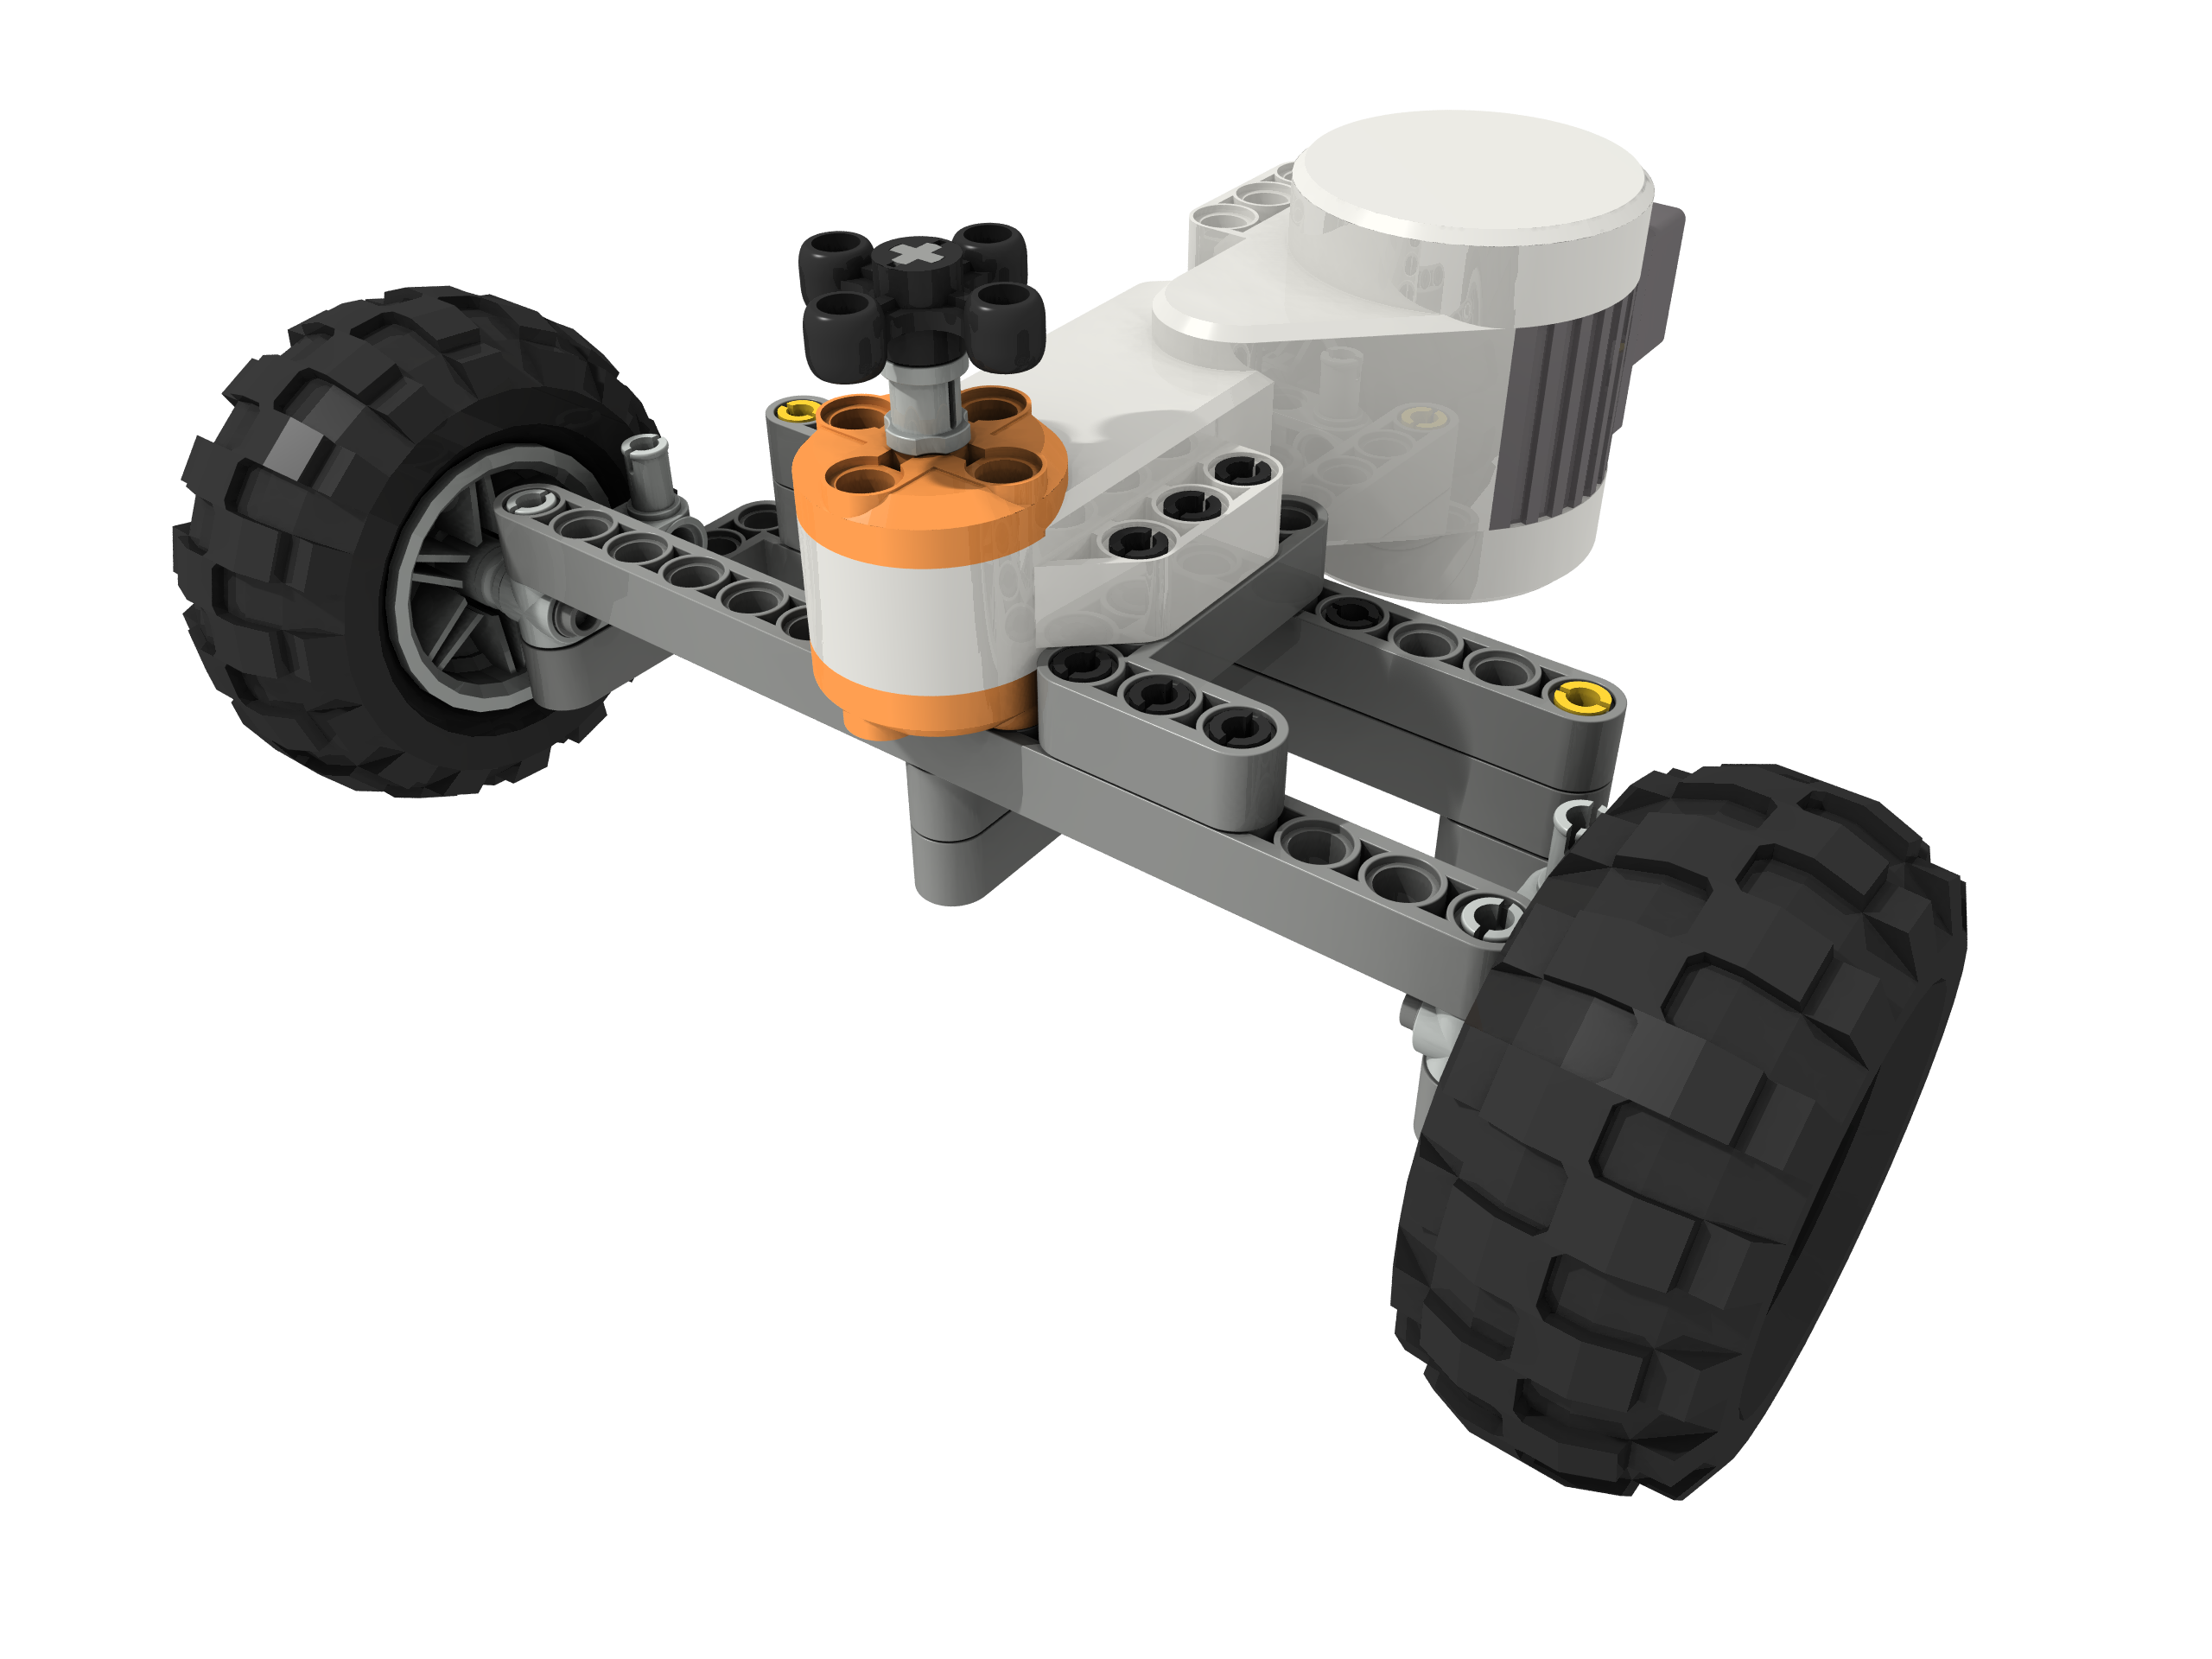 Ackermann Steering Geometry Mindstorms Podcast